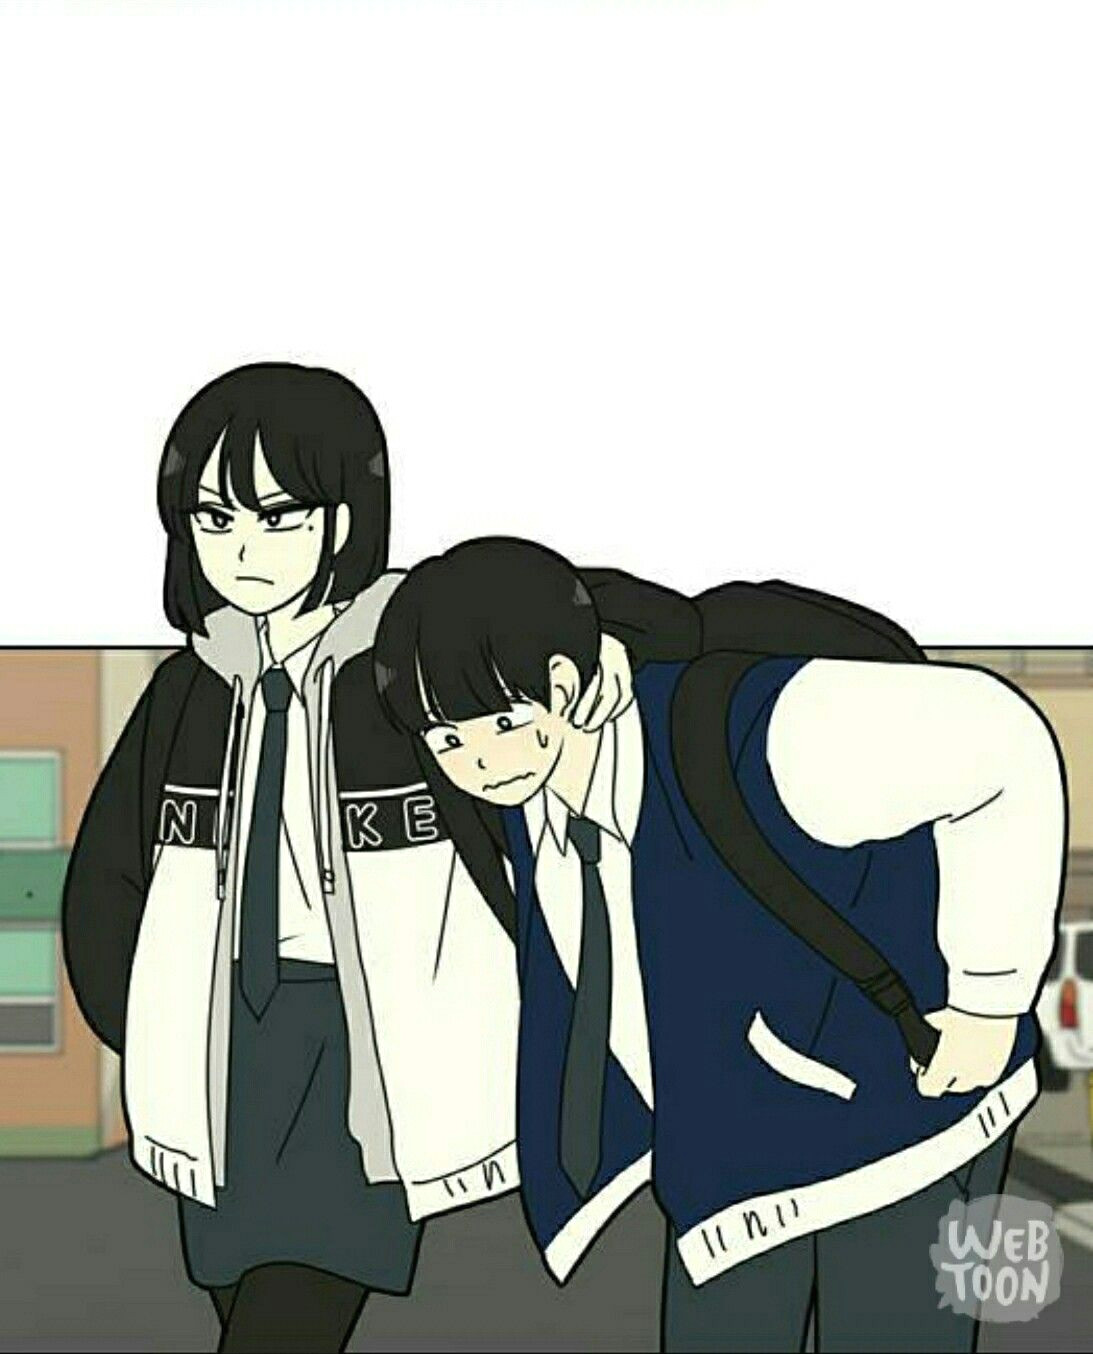 manhwa manga webtoon anime couples revolution aesthetics character design